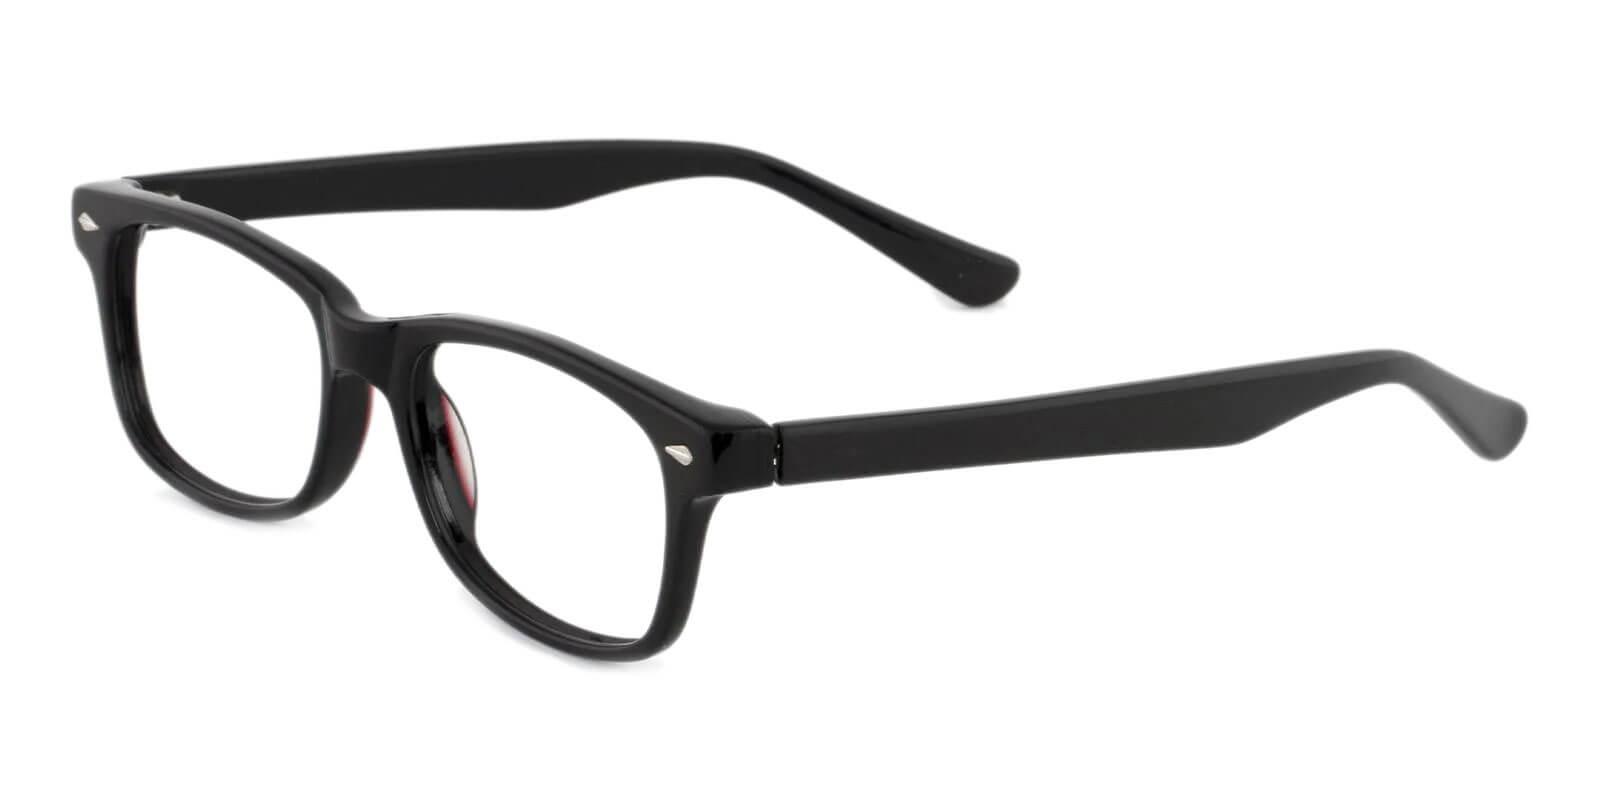 Wisdom Black Acetate UniversalBridgeFit , Eyeglasses Frames from ABBE Glasses